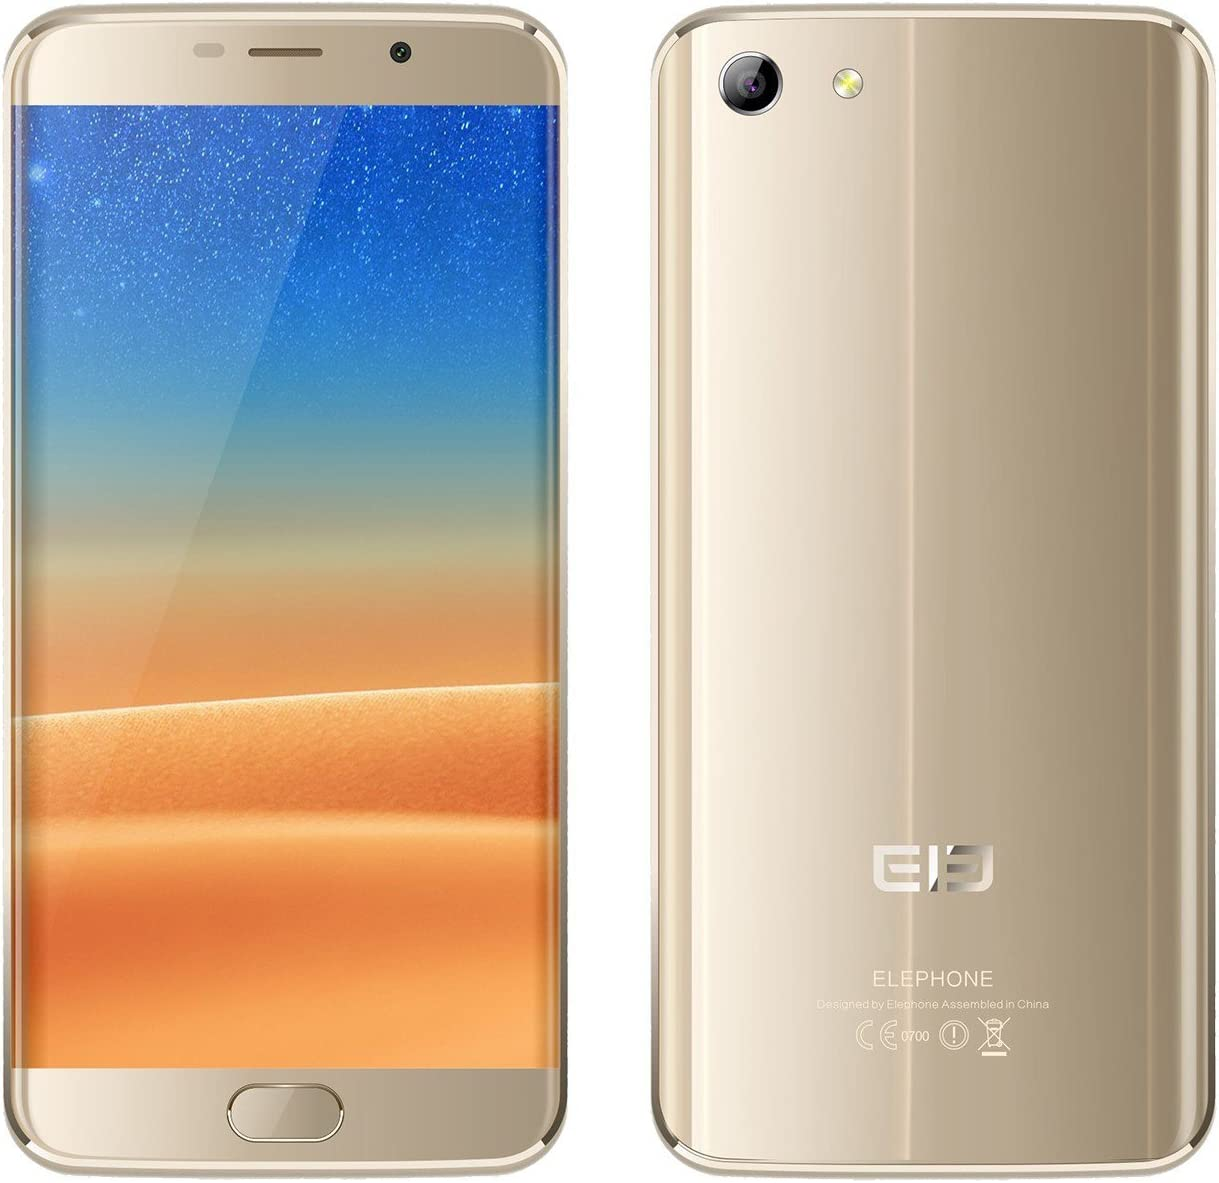 Elephone España] Elephone S7 Smartphone Libre 4G LTE Android 6.0 ...